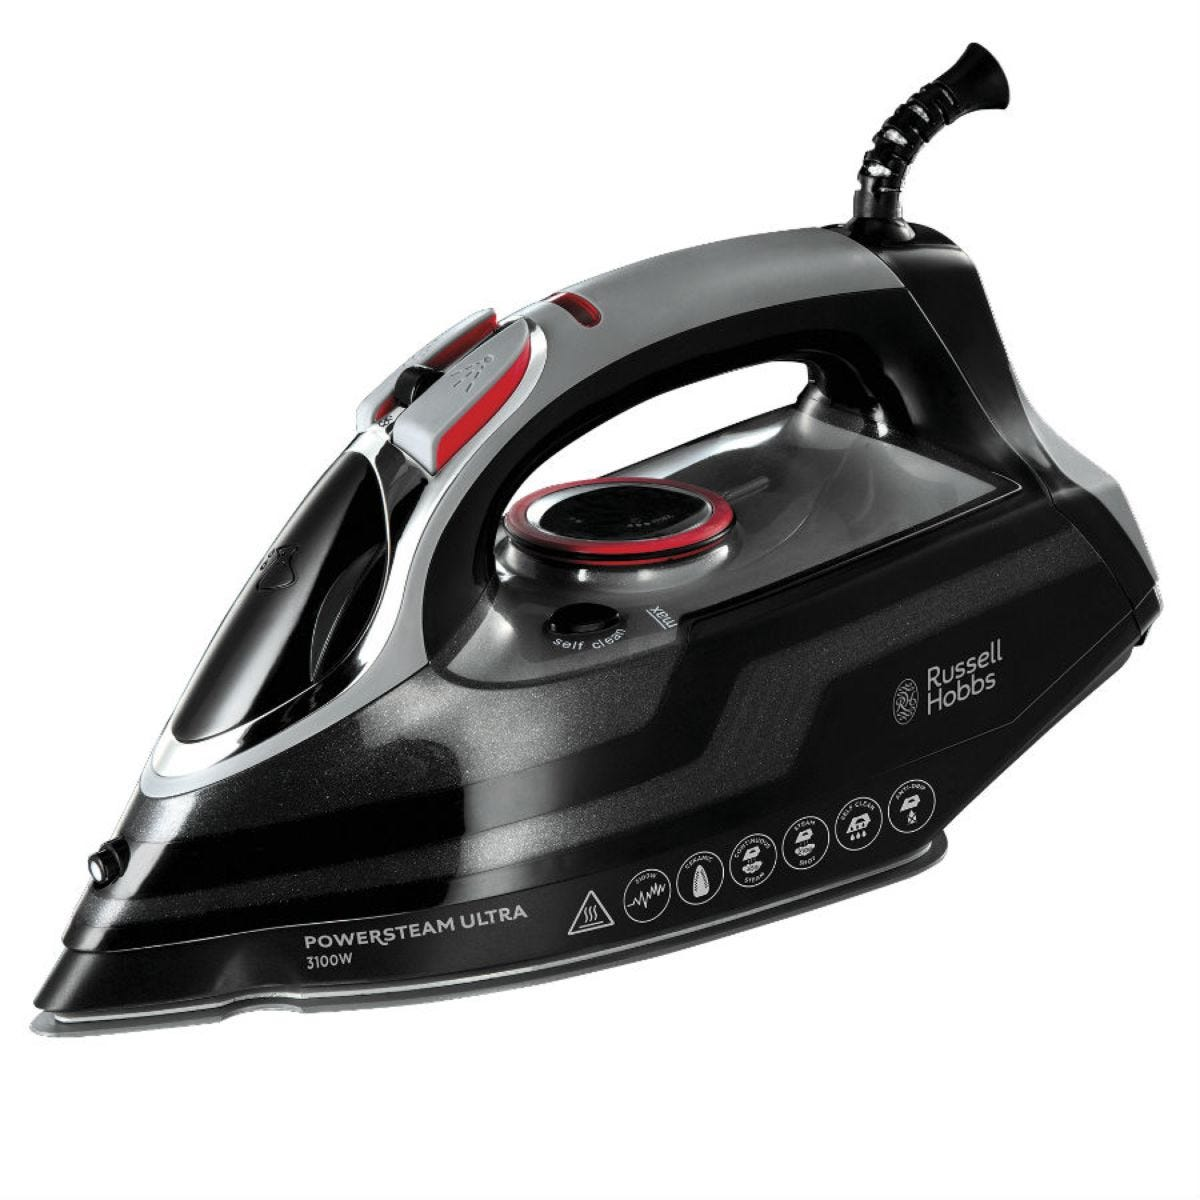 Russell Hobbs 20630 Powersteam Ultra 3100W Vertical Steam Iron – Black/Silver/Red